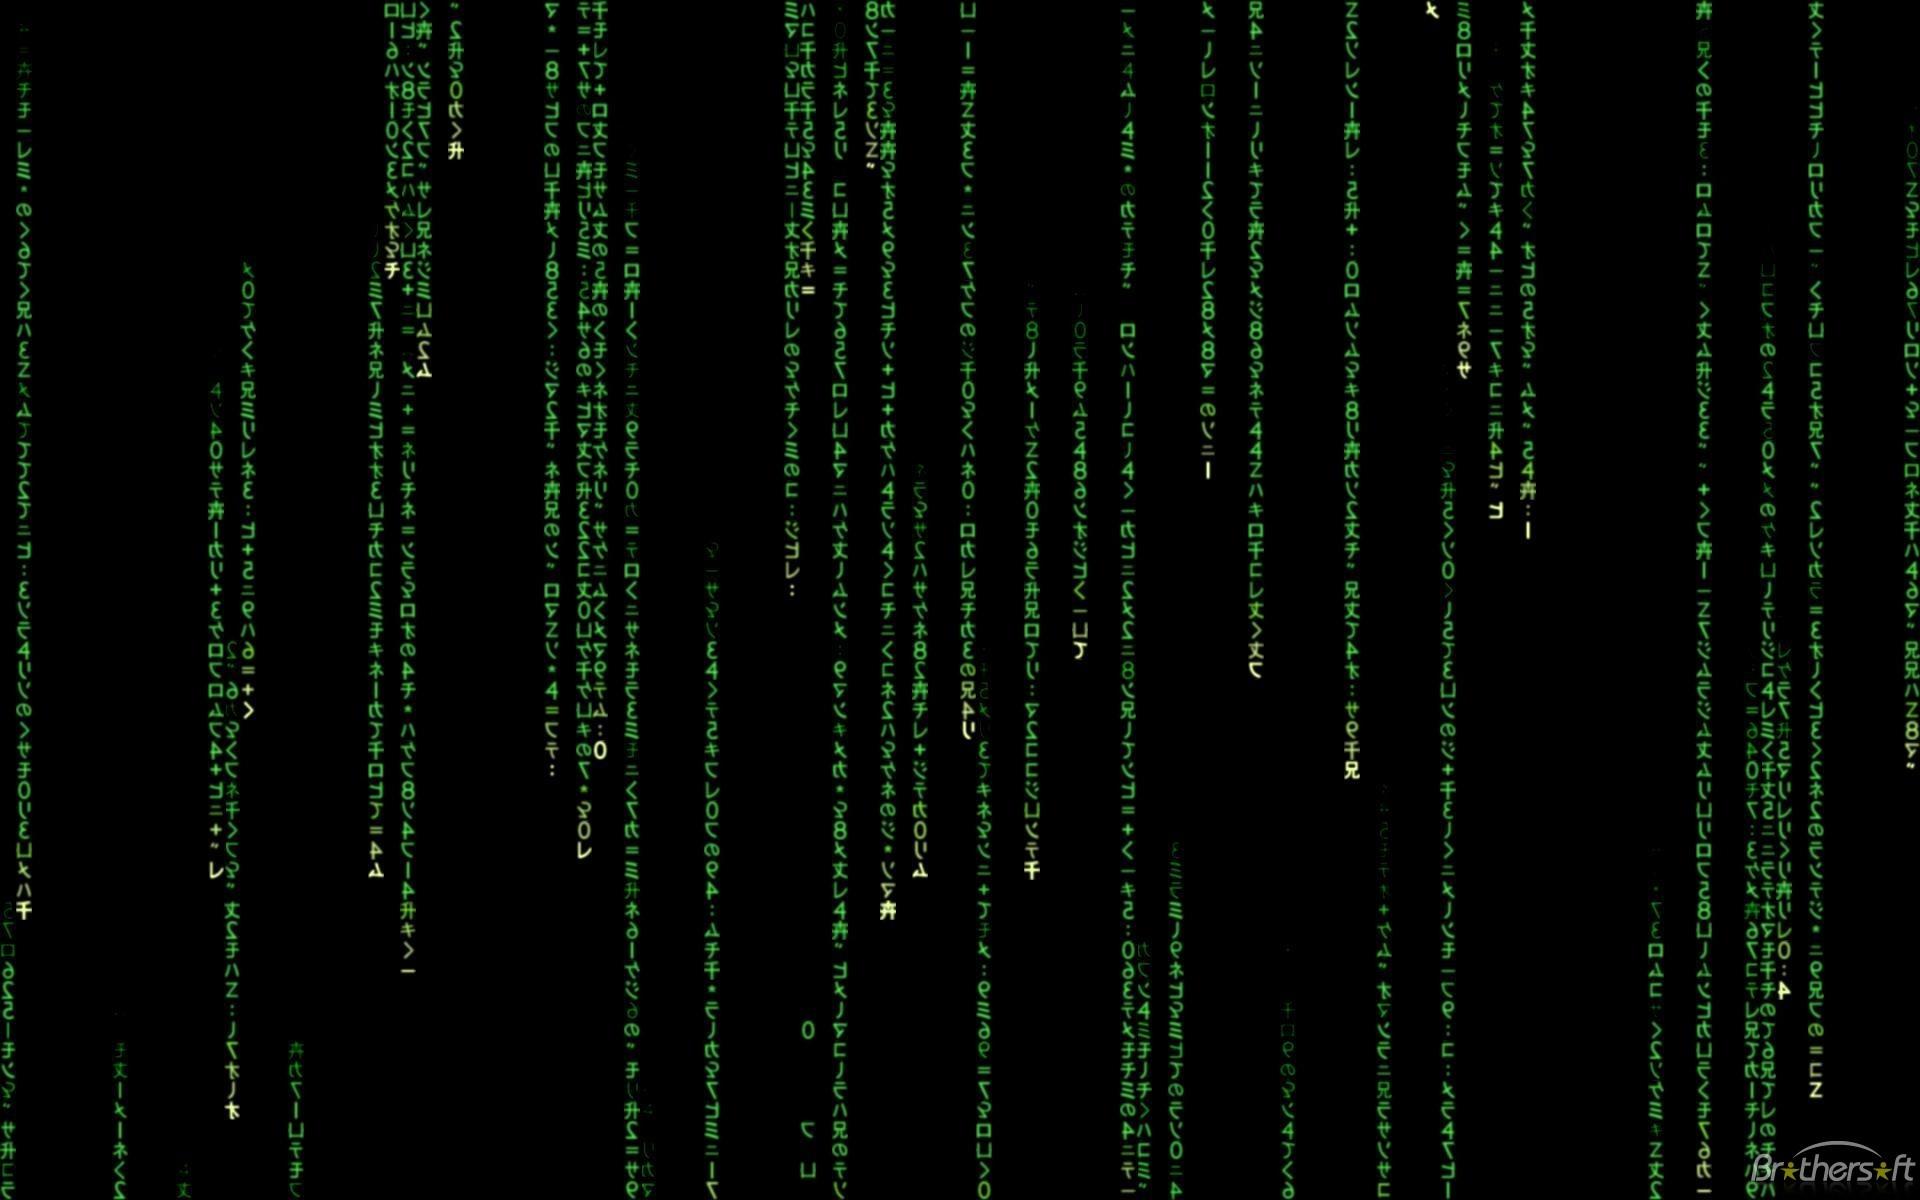 screen, matrix, saver, savers, softimage